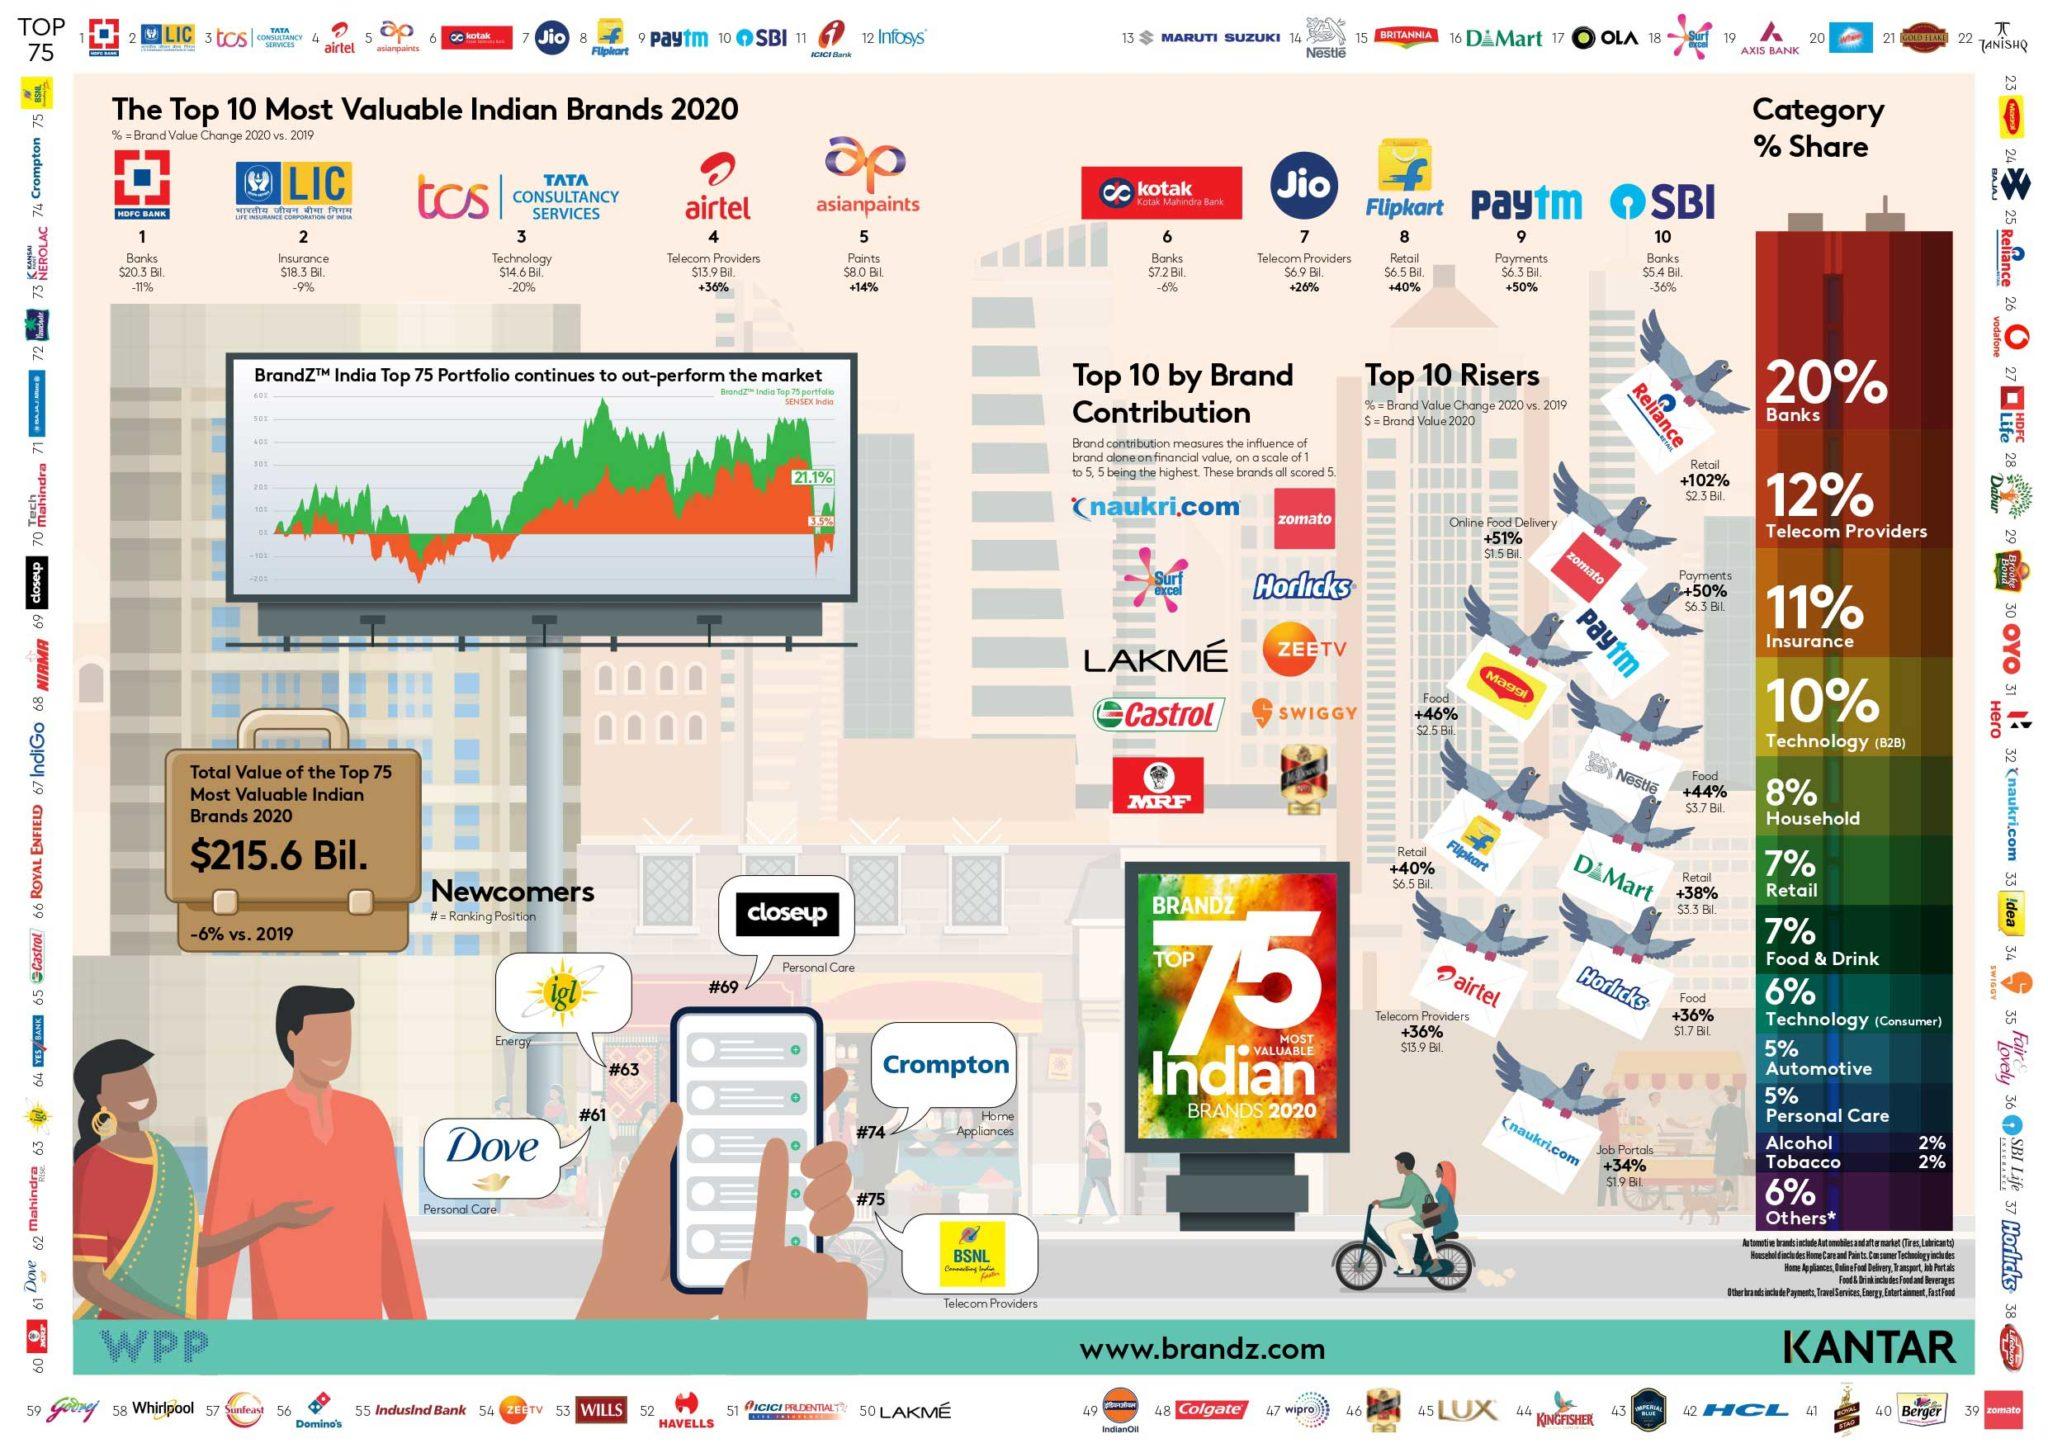 IMAGE-BrandZ_Top_Most_Valuable_75_Indian_Brands_Infographic-mediabrief-FOR-WEB-1-scaled.jpg